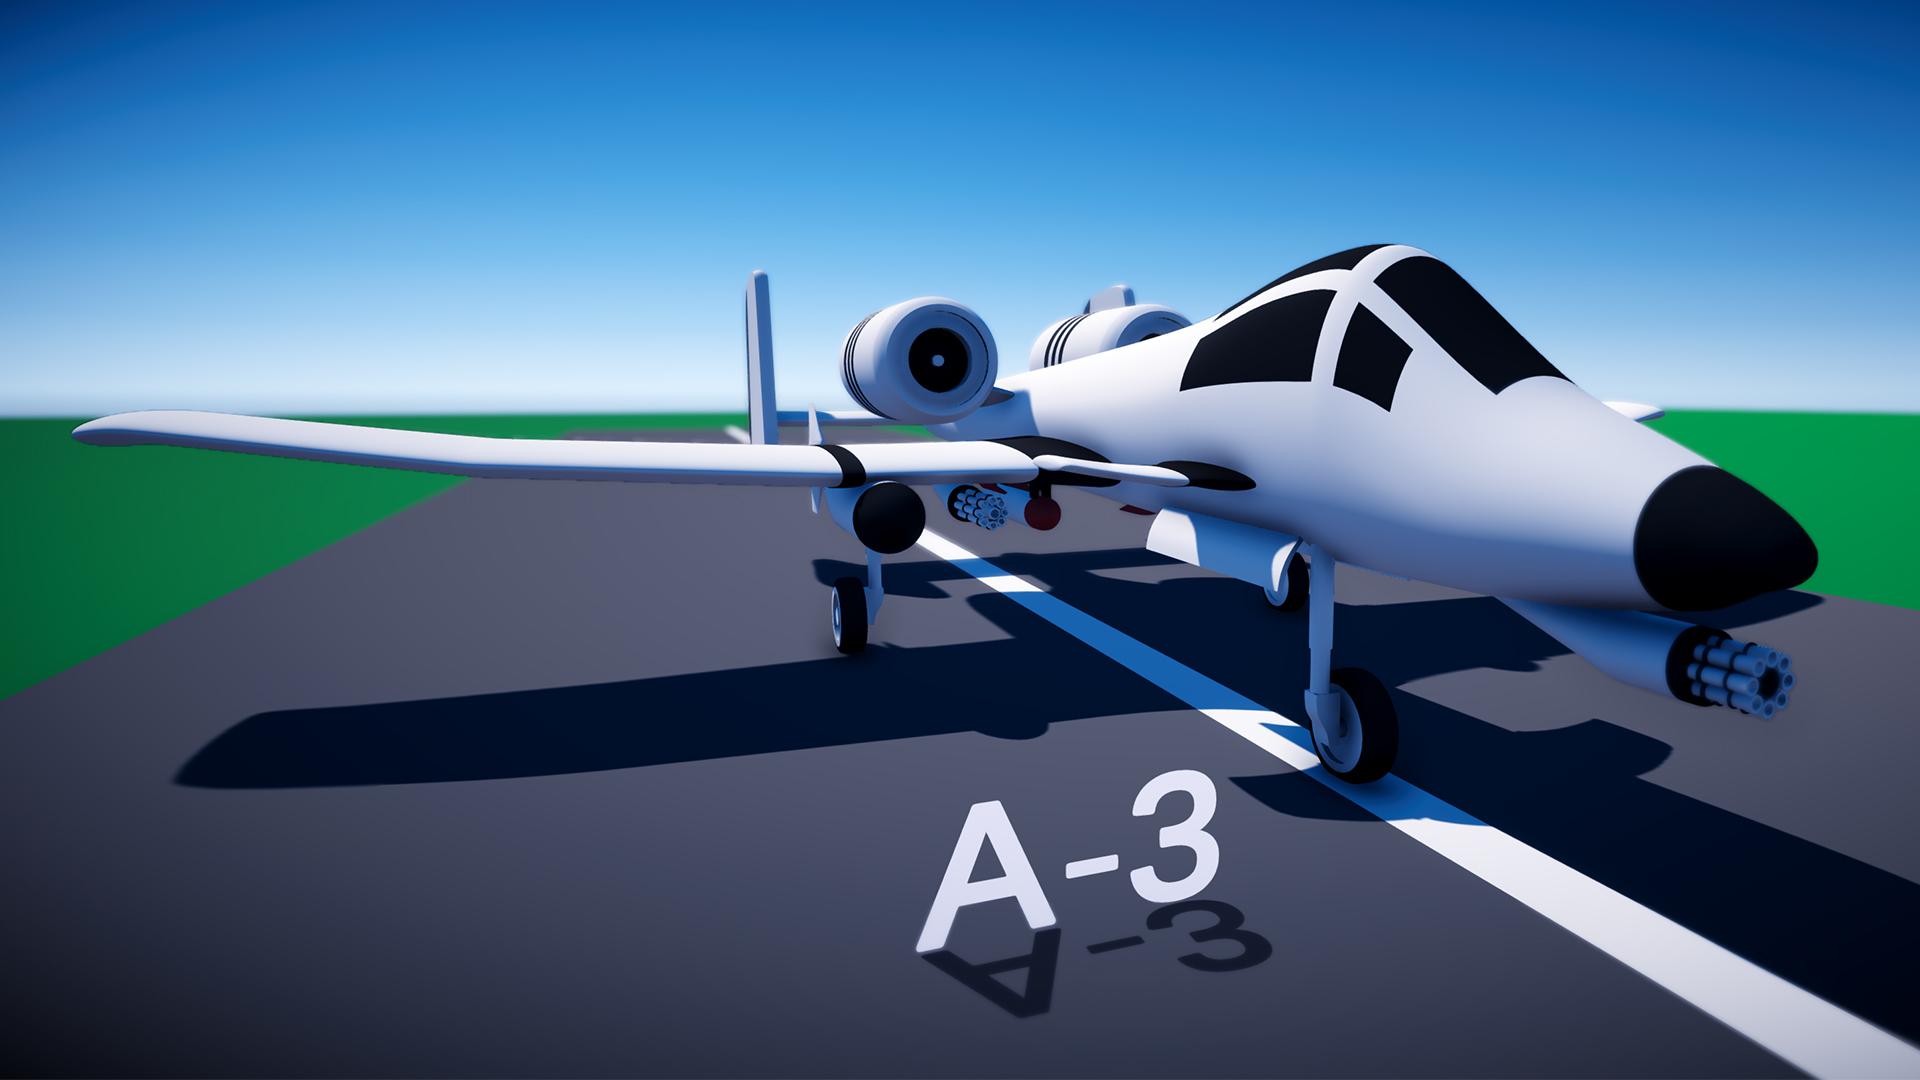 A-3 Military Jet